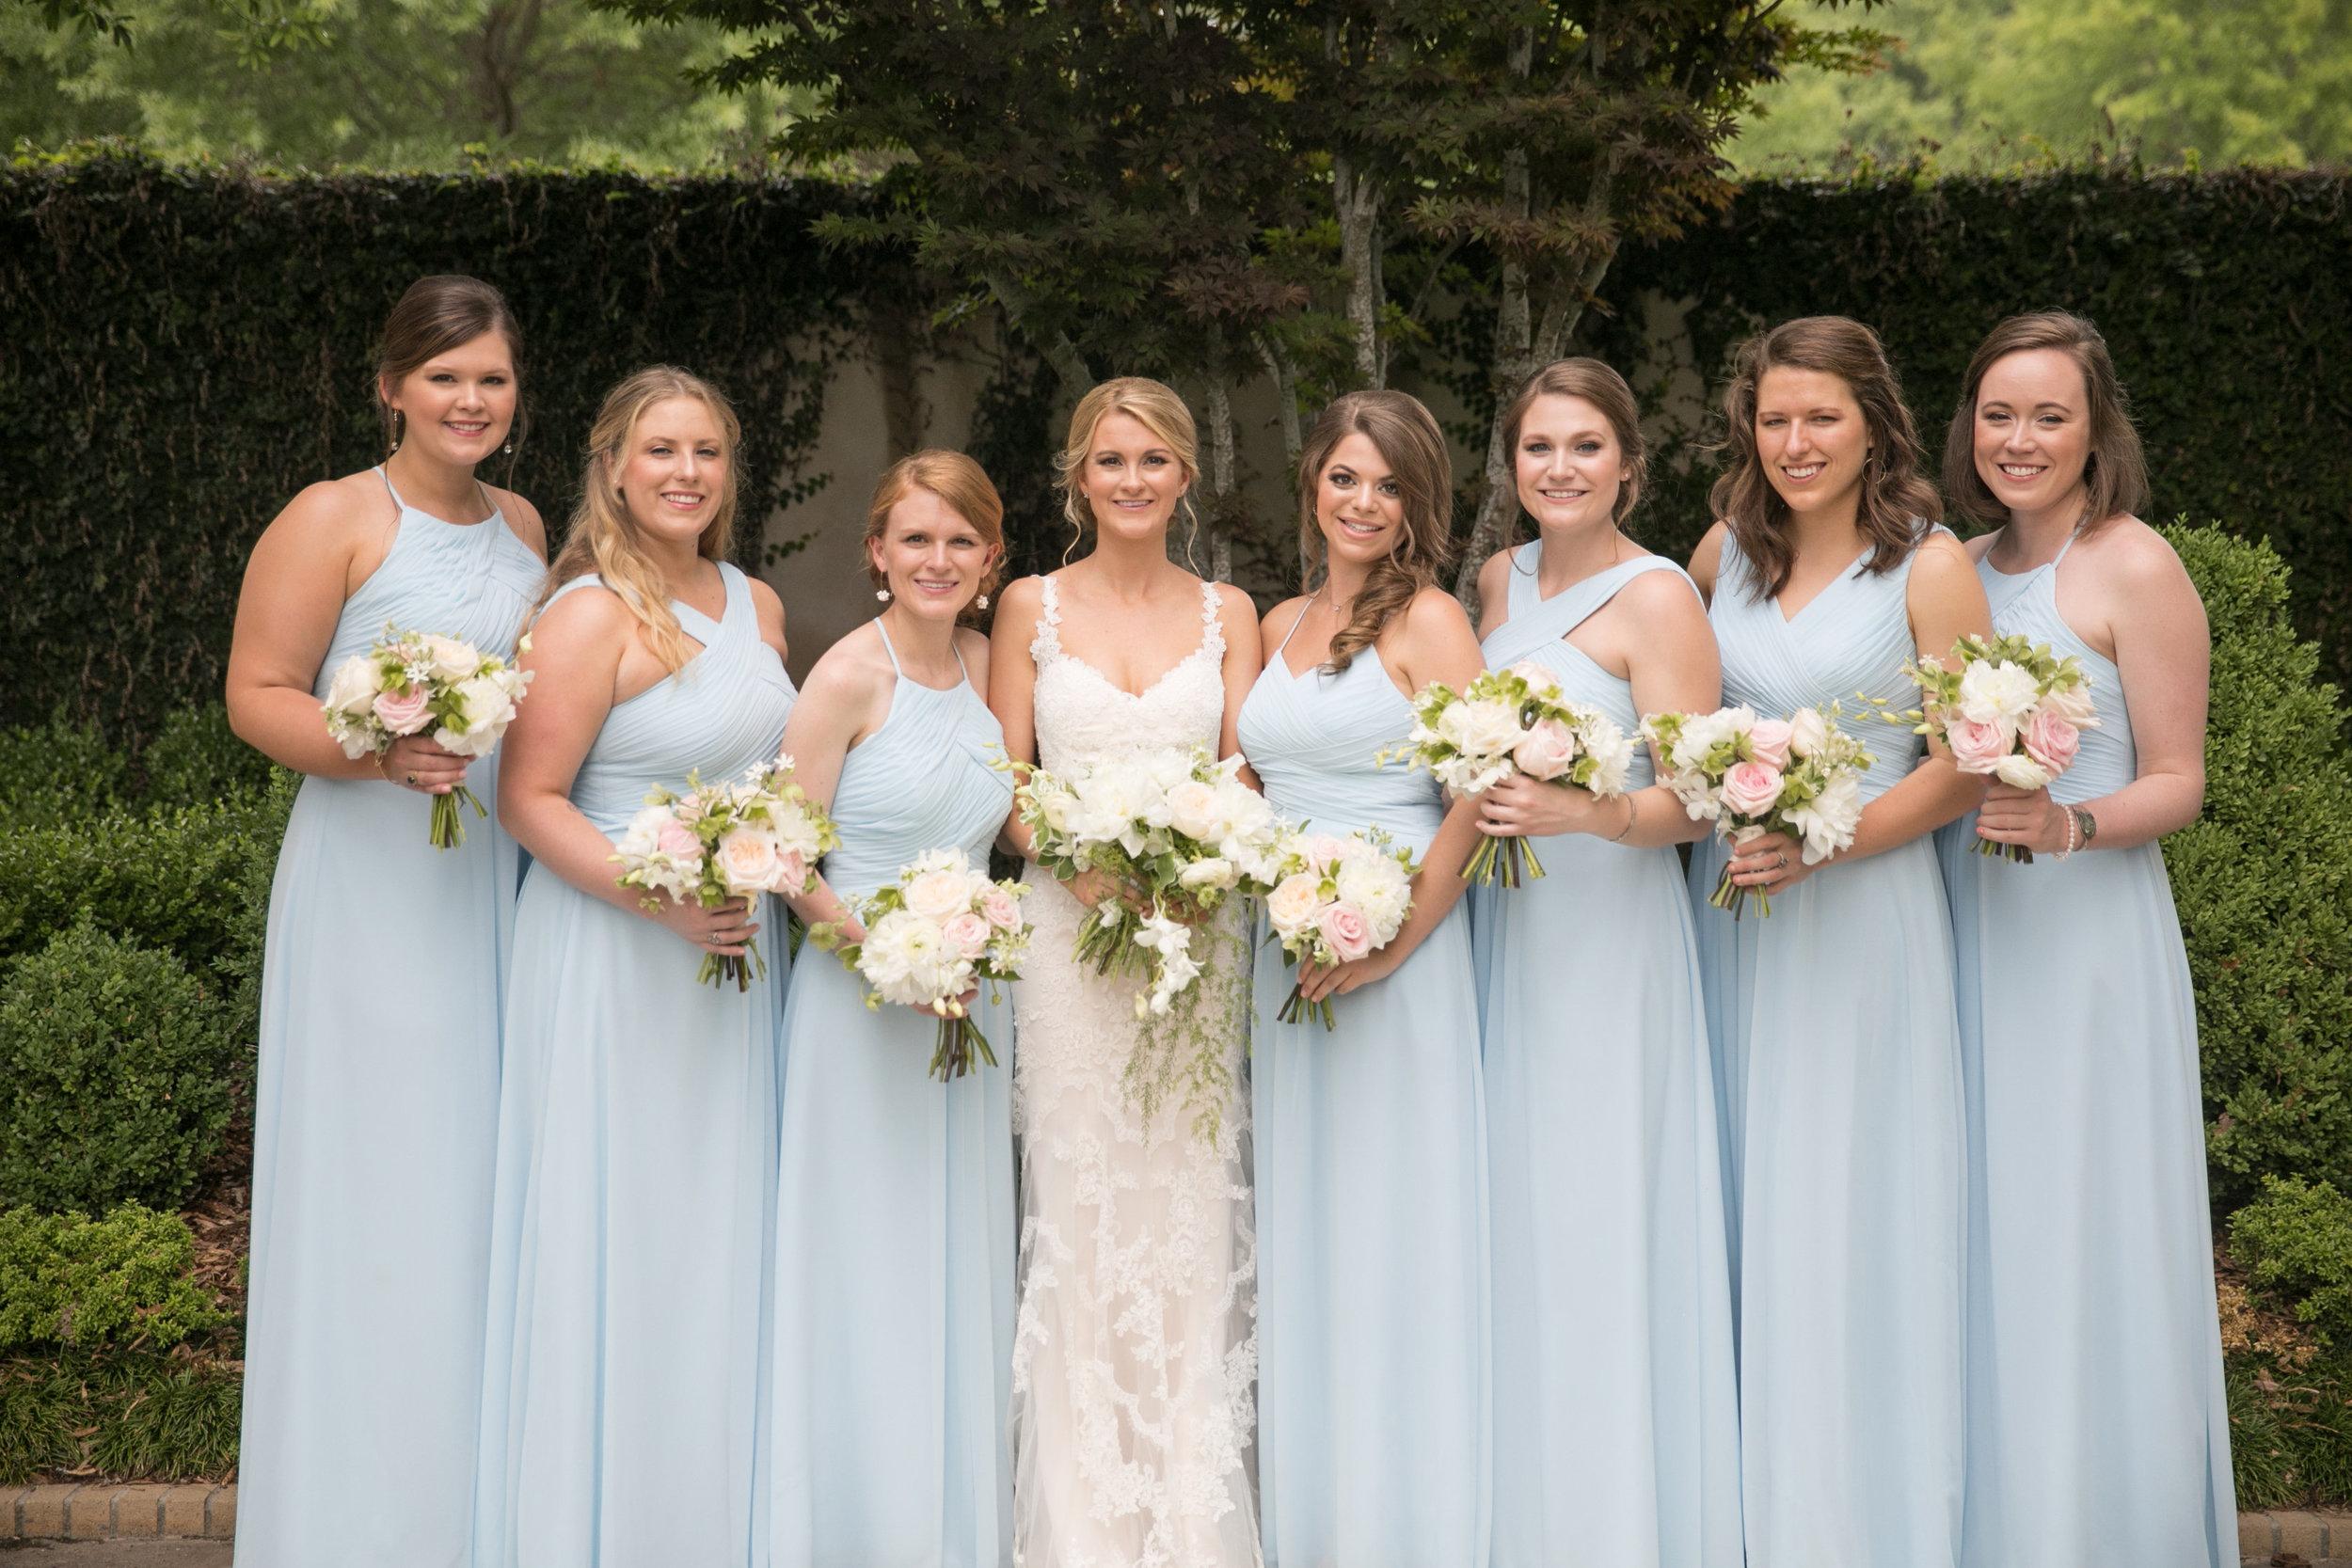 aly bridal party.JPG